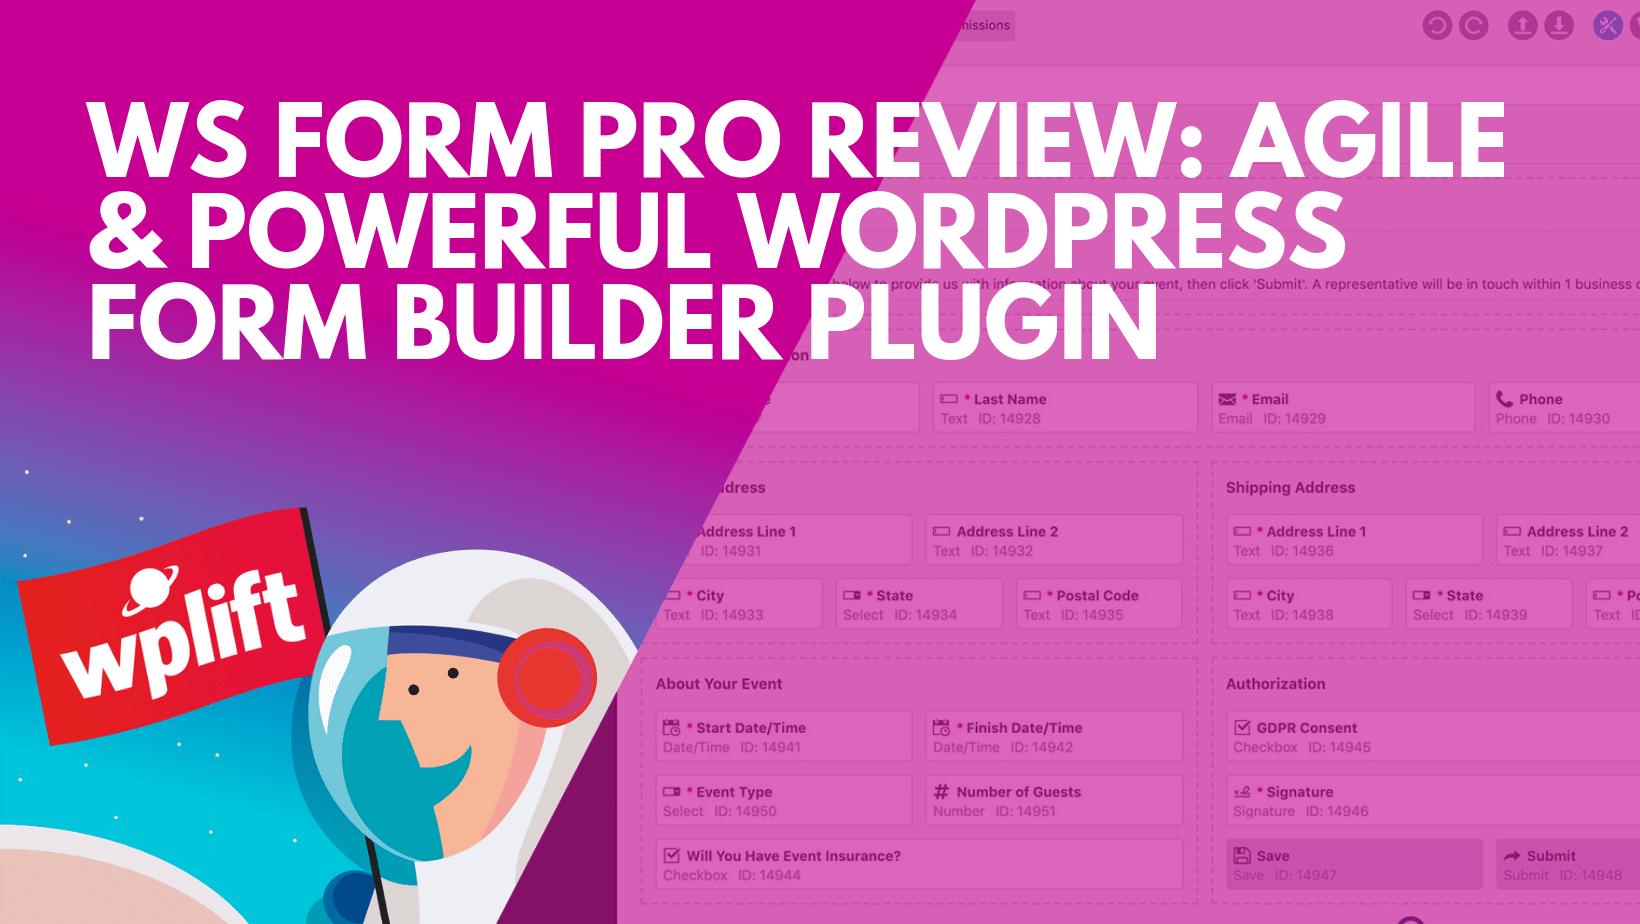 Agile & Powerful WordPress Form Builder Plugin